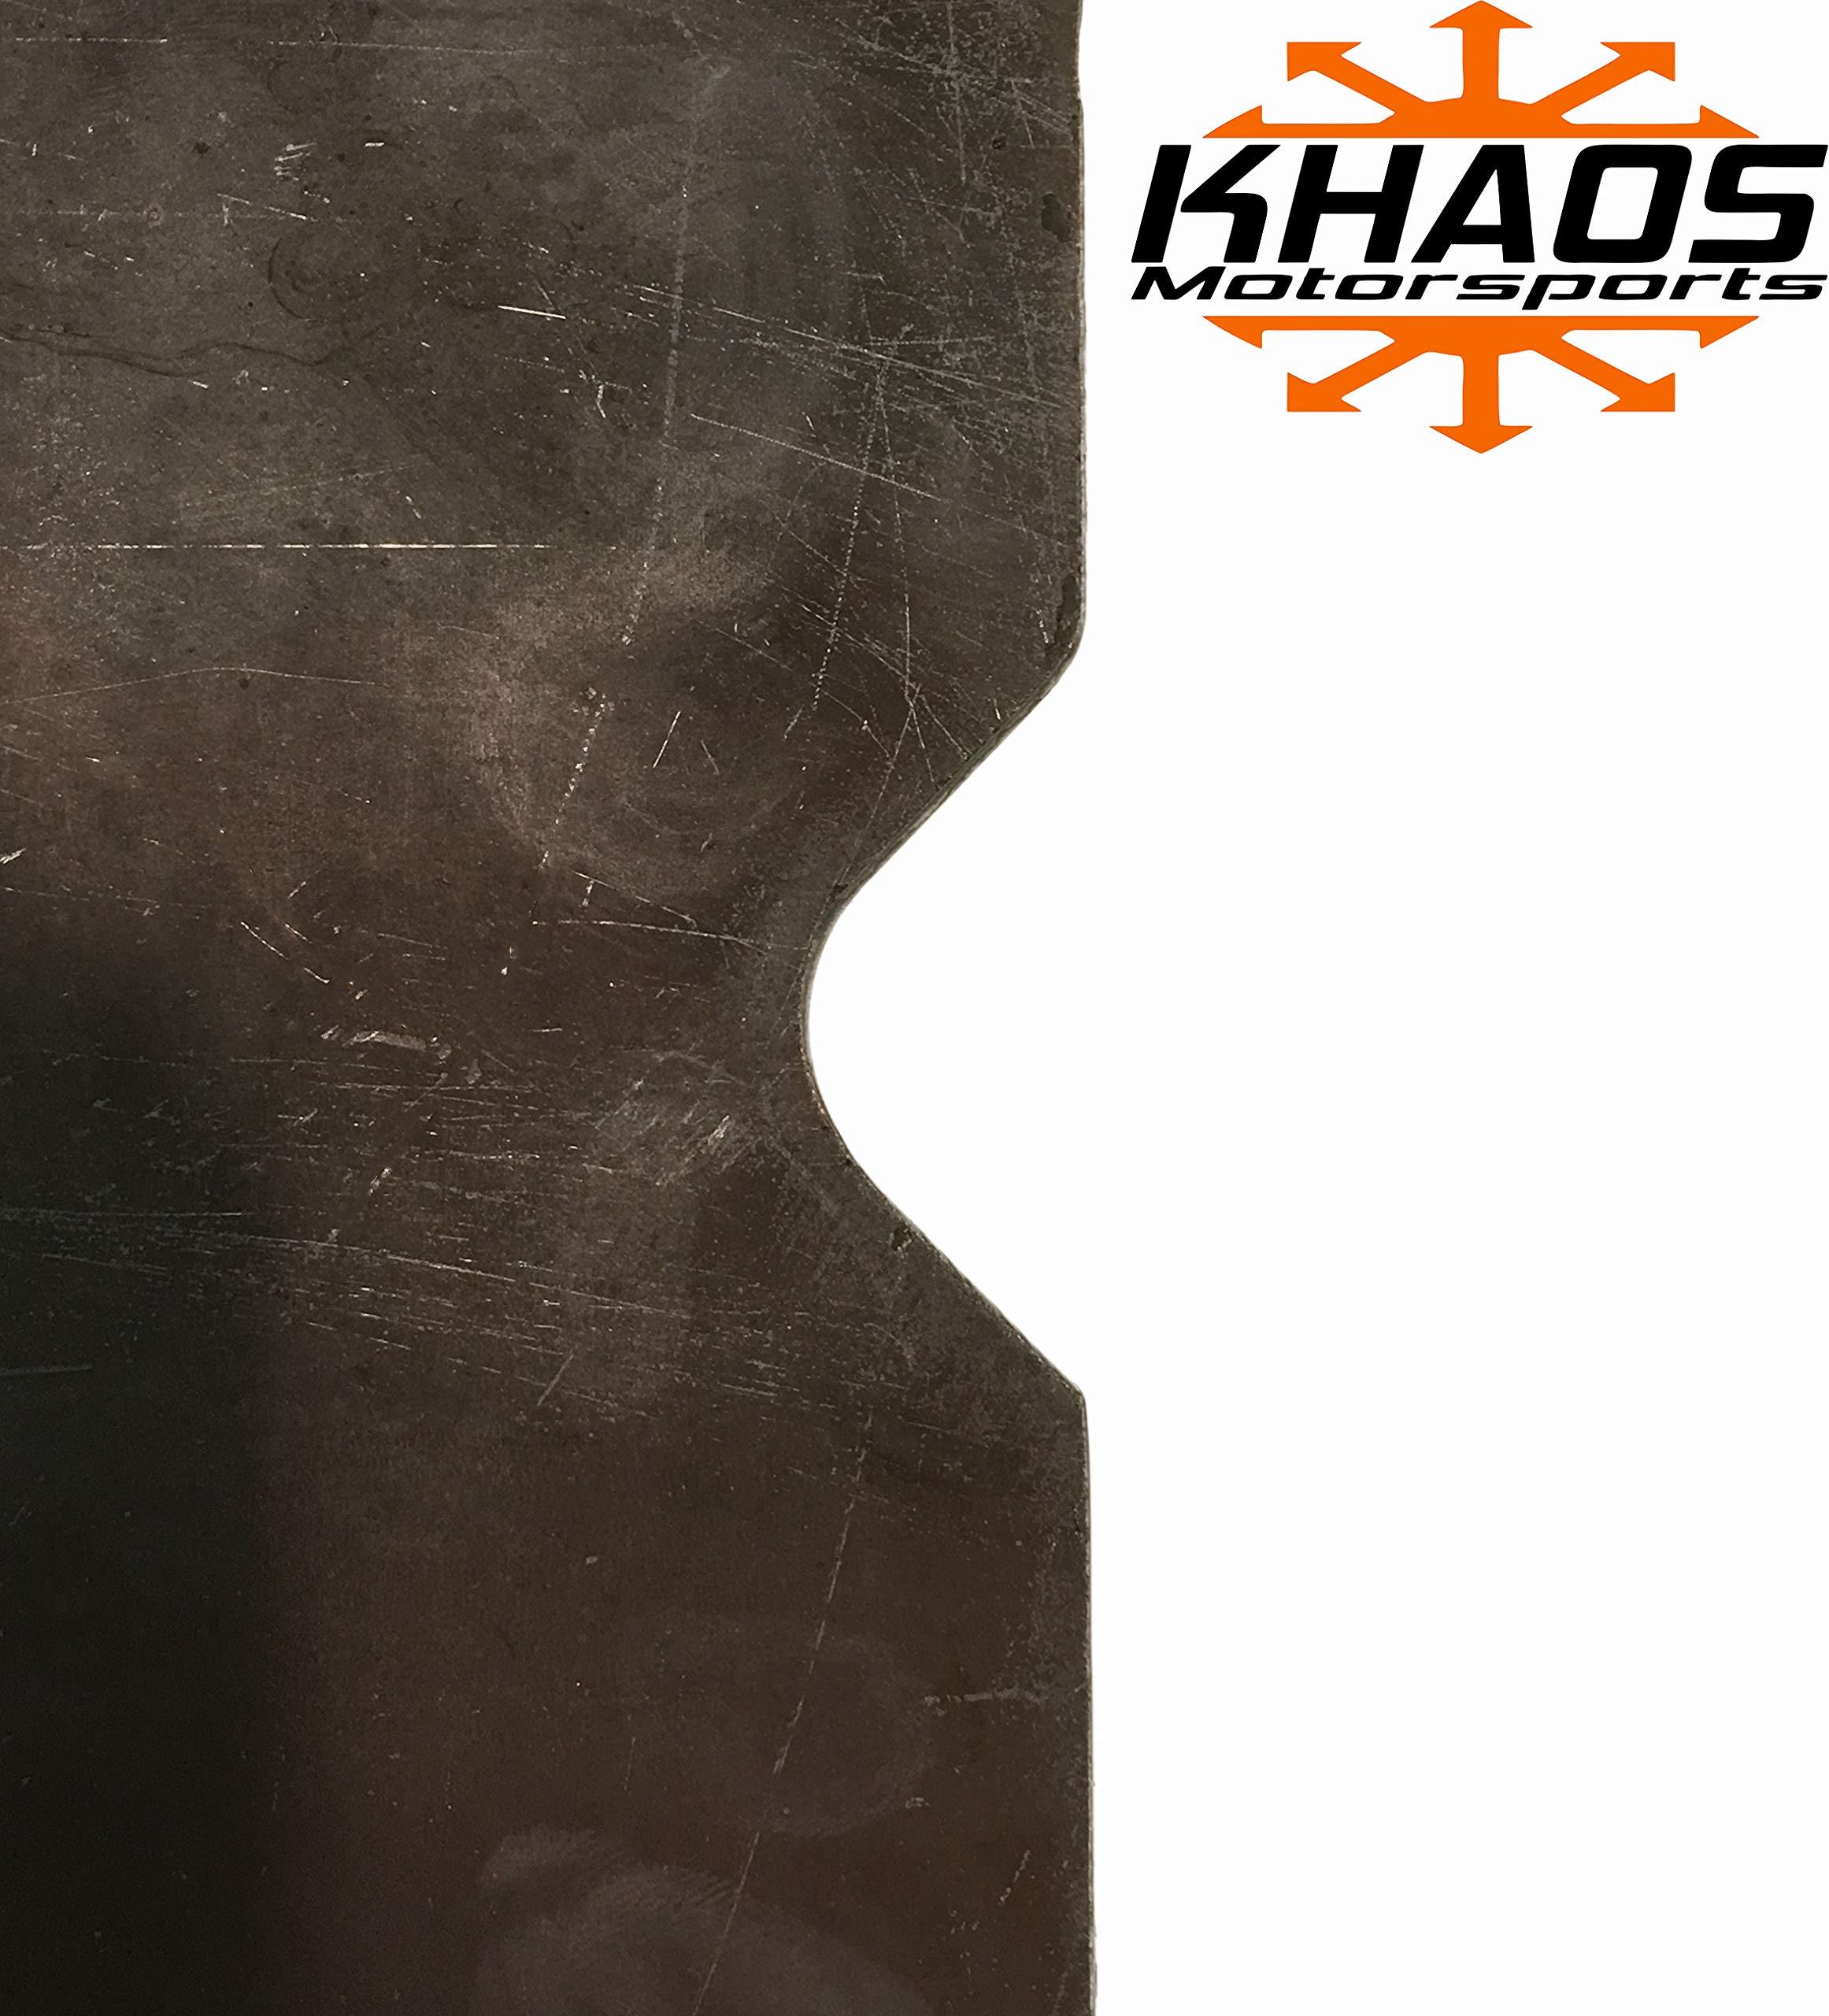 PRESS PLATES ARBOR PARALLELS 1''X8''X8'' SET by Khaos Motorsports (Image #4)